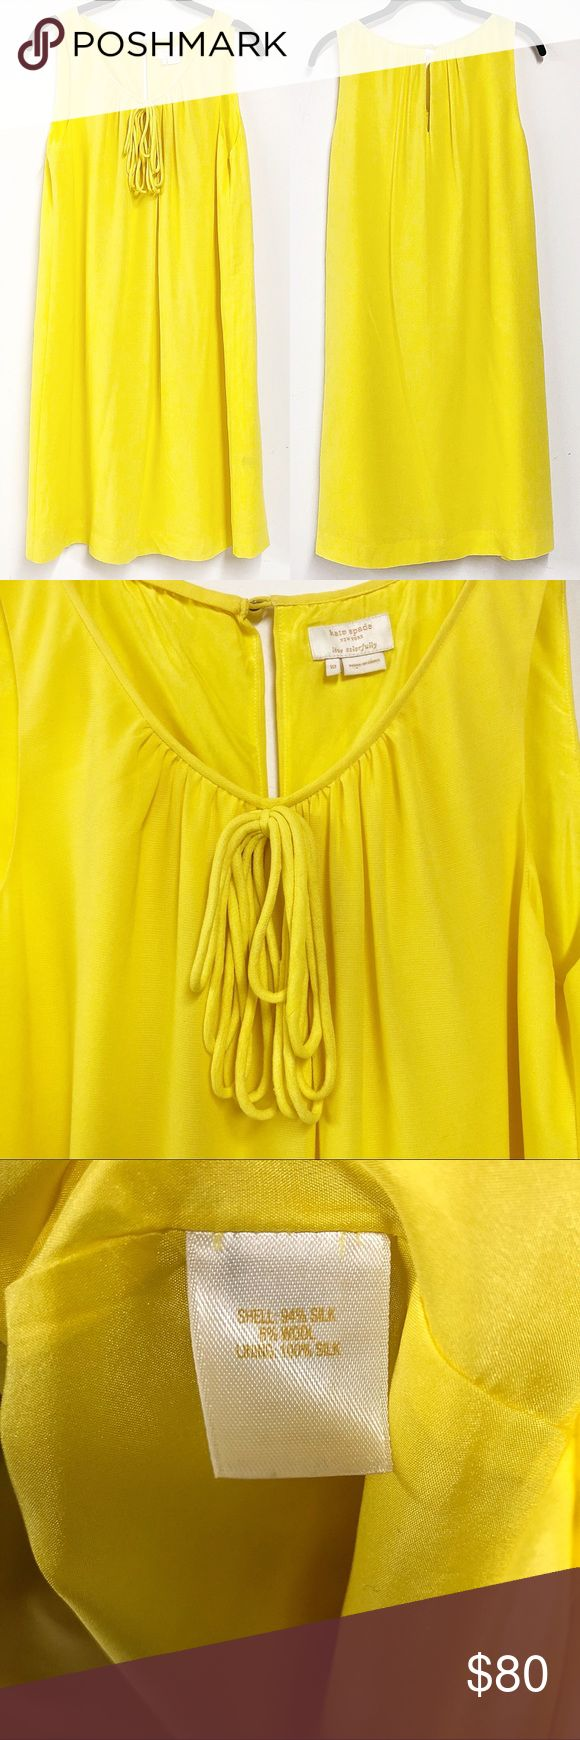 Kate Spade Dress Kate Spade bright yellow shift dress. 95% silk, 5% wool. Size 10. Excellent condition. Make an offer! kate spade Dresses